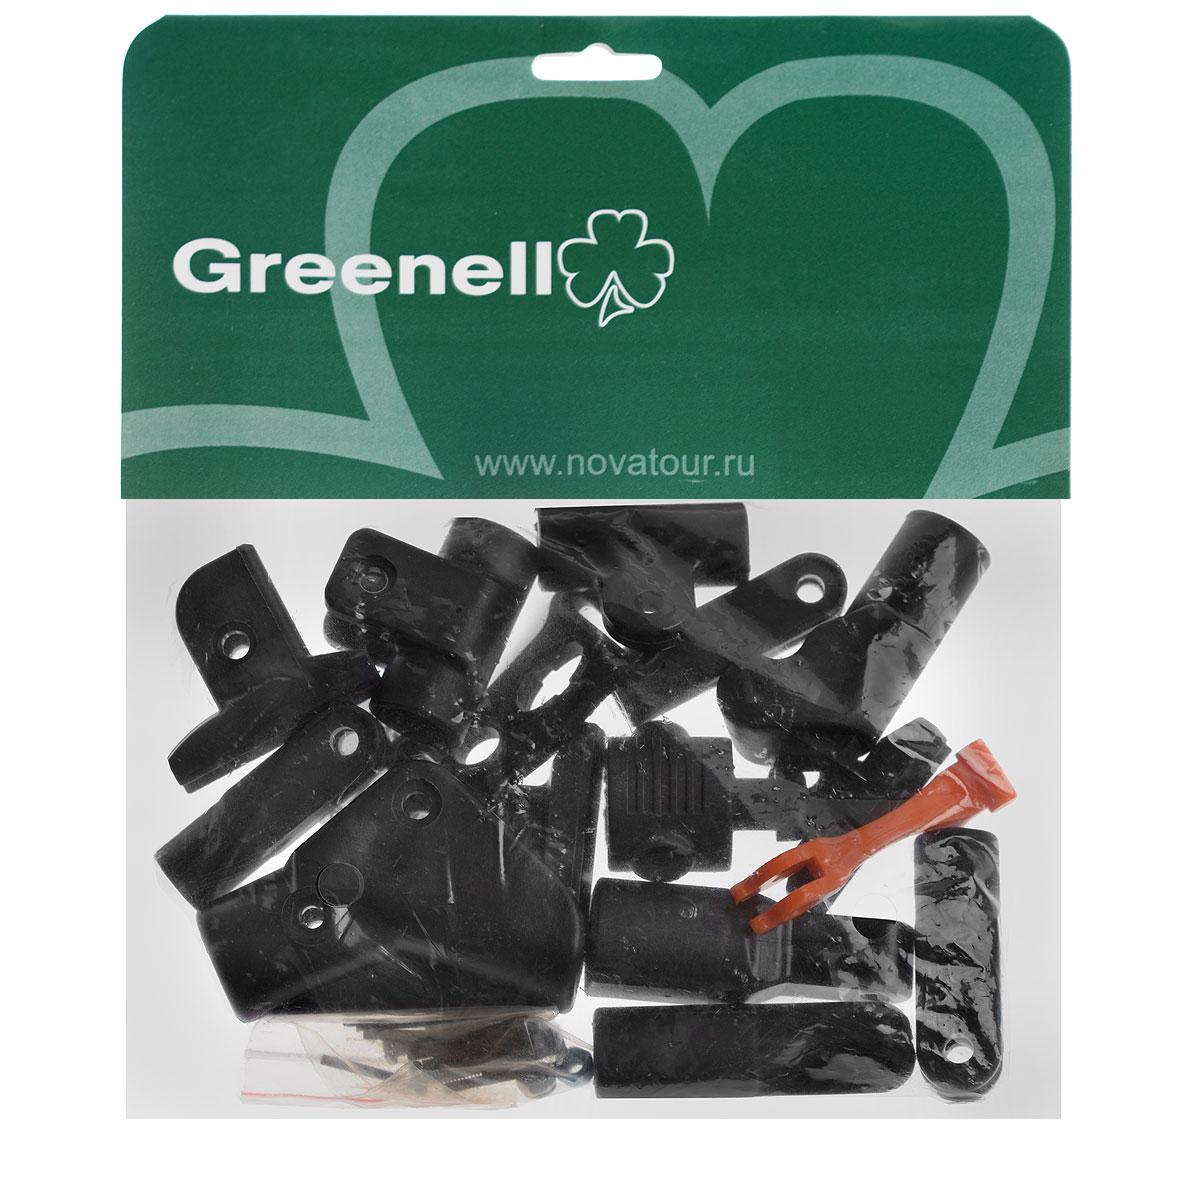 Ремкомплект Greenell